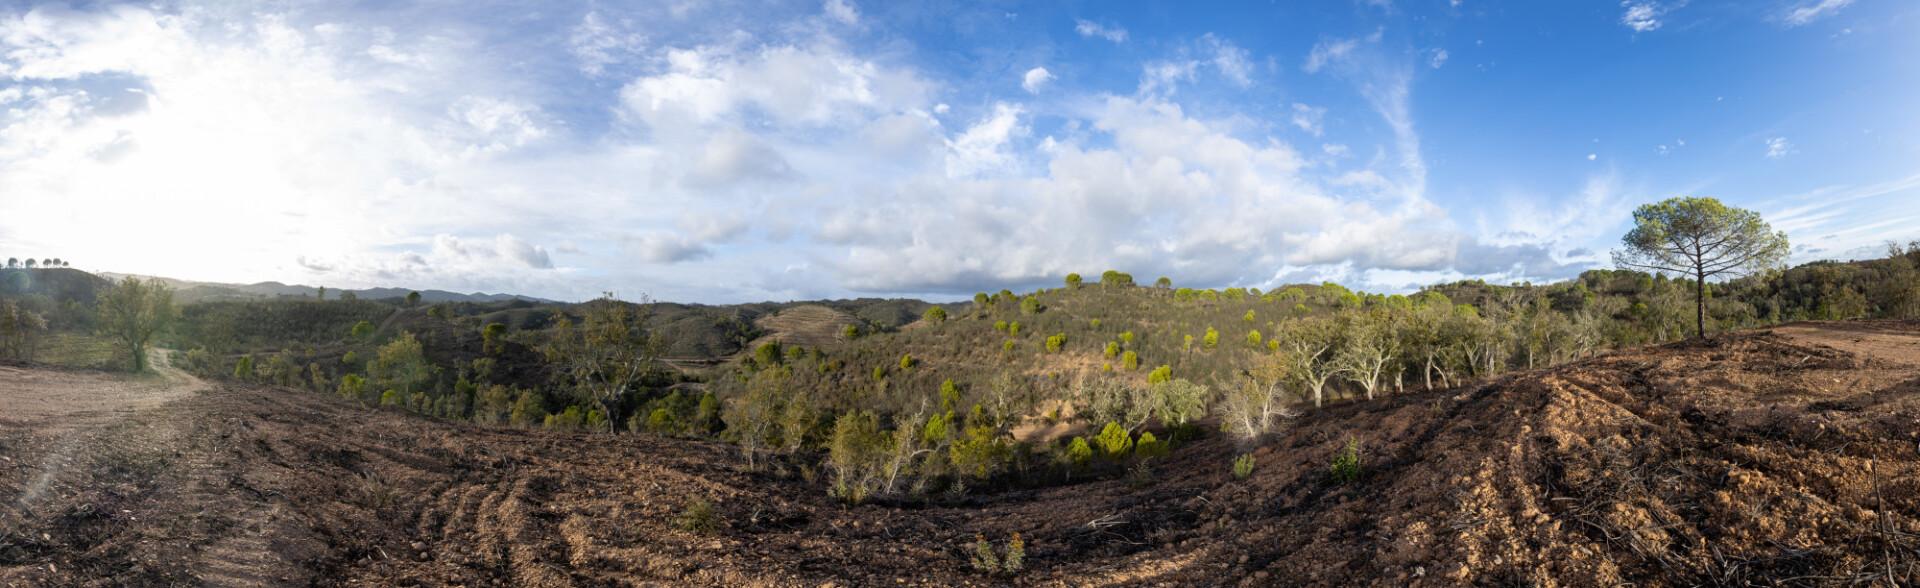 Untouched nature landscape in Portugal